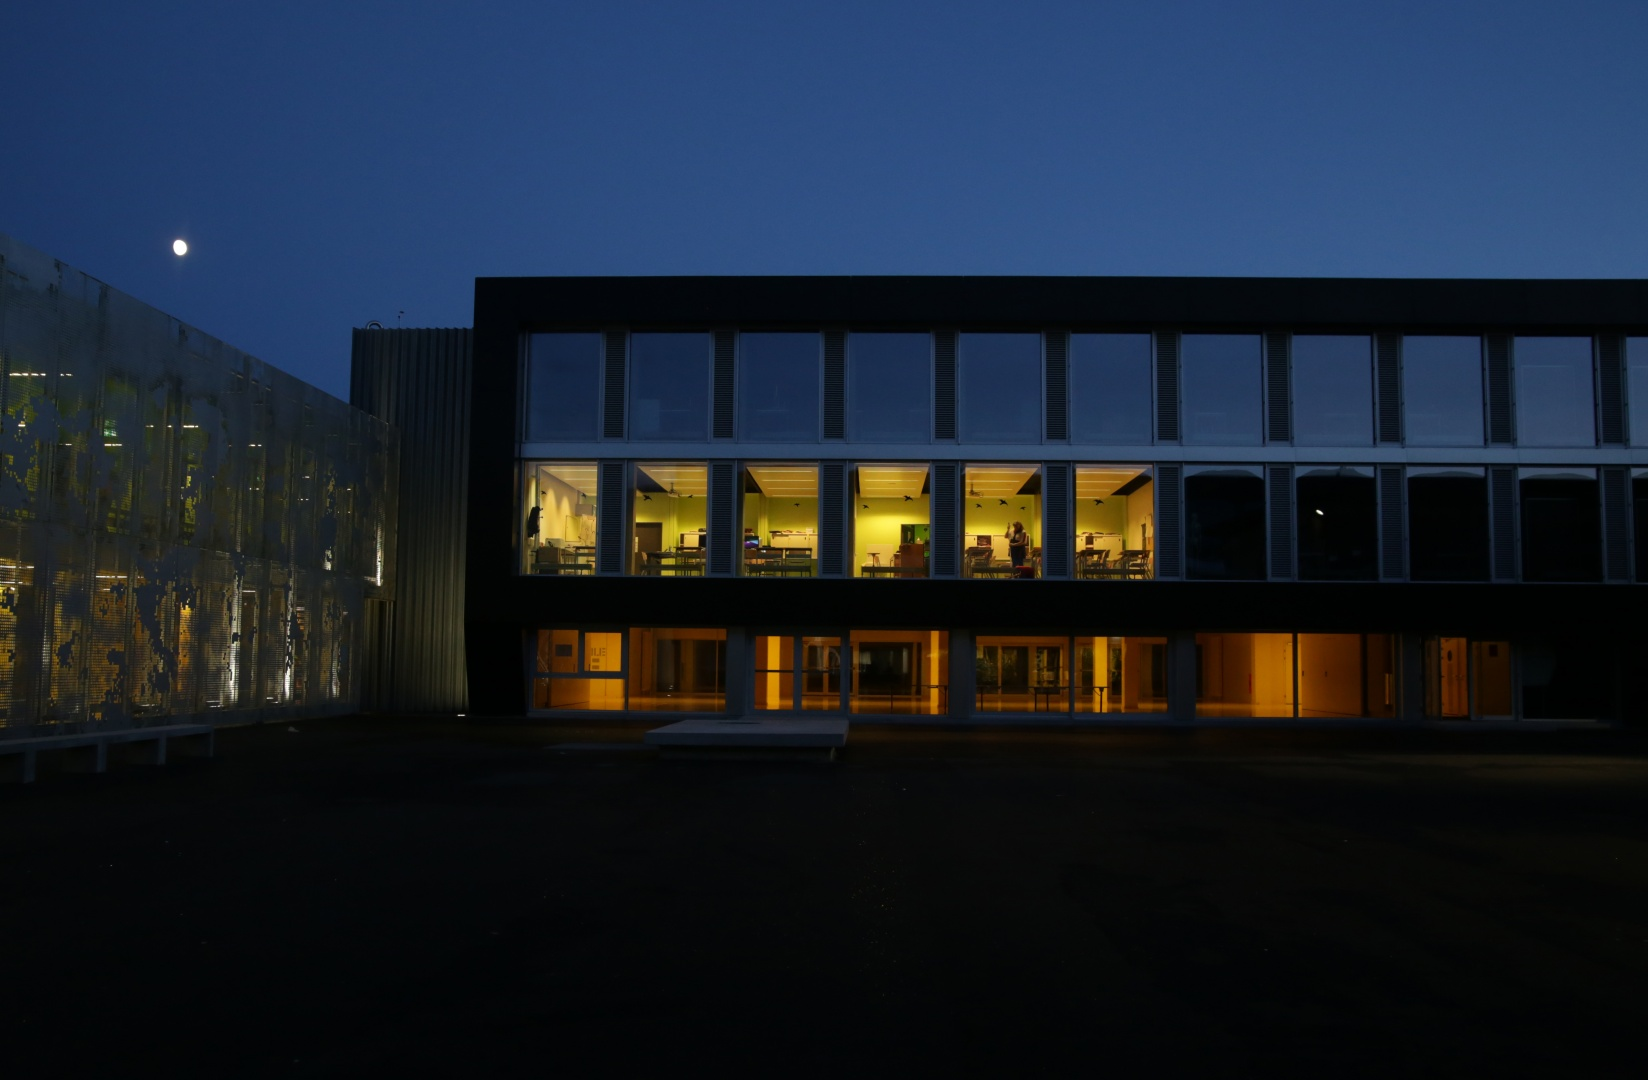 Façade B2 de nuit © Guenin Huni Architectes